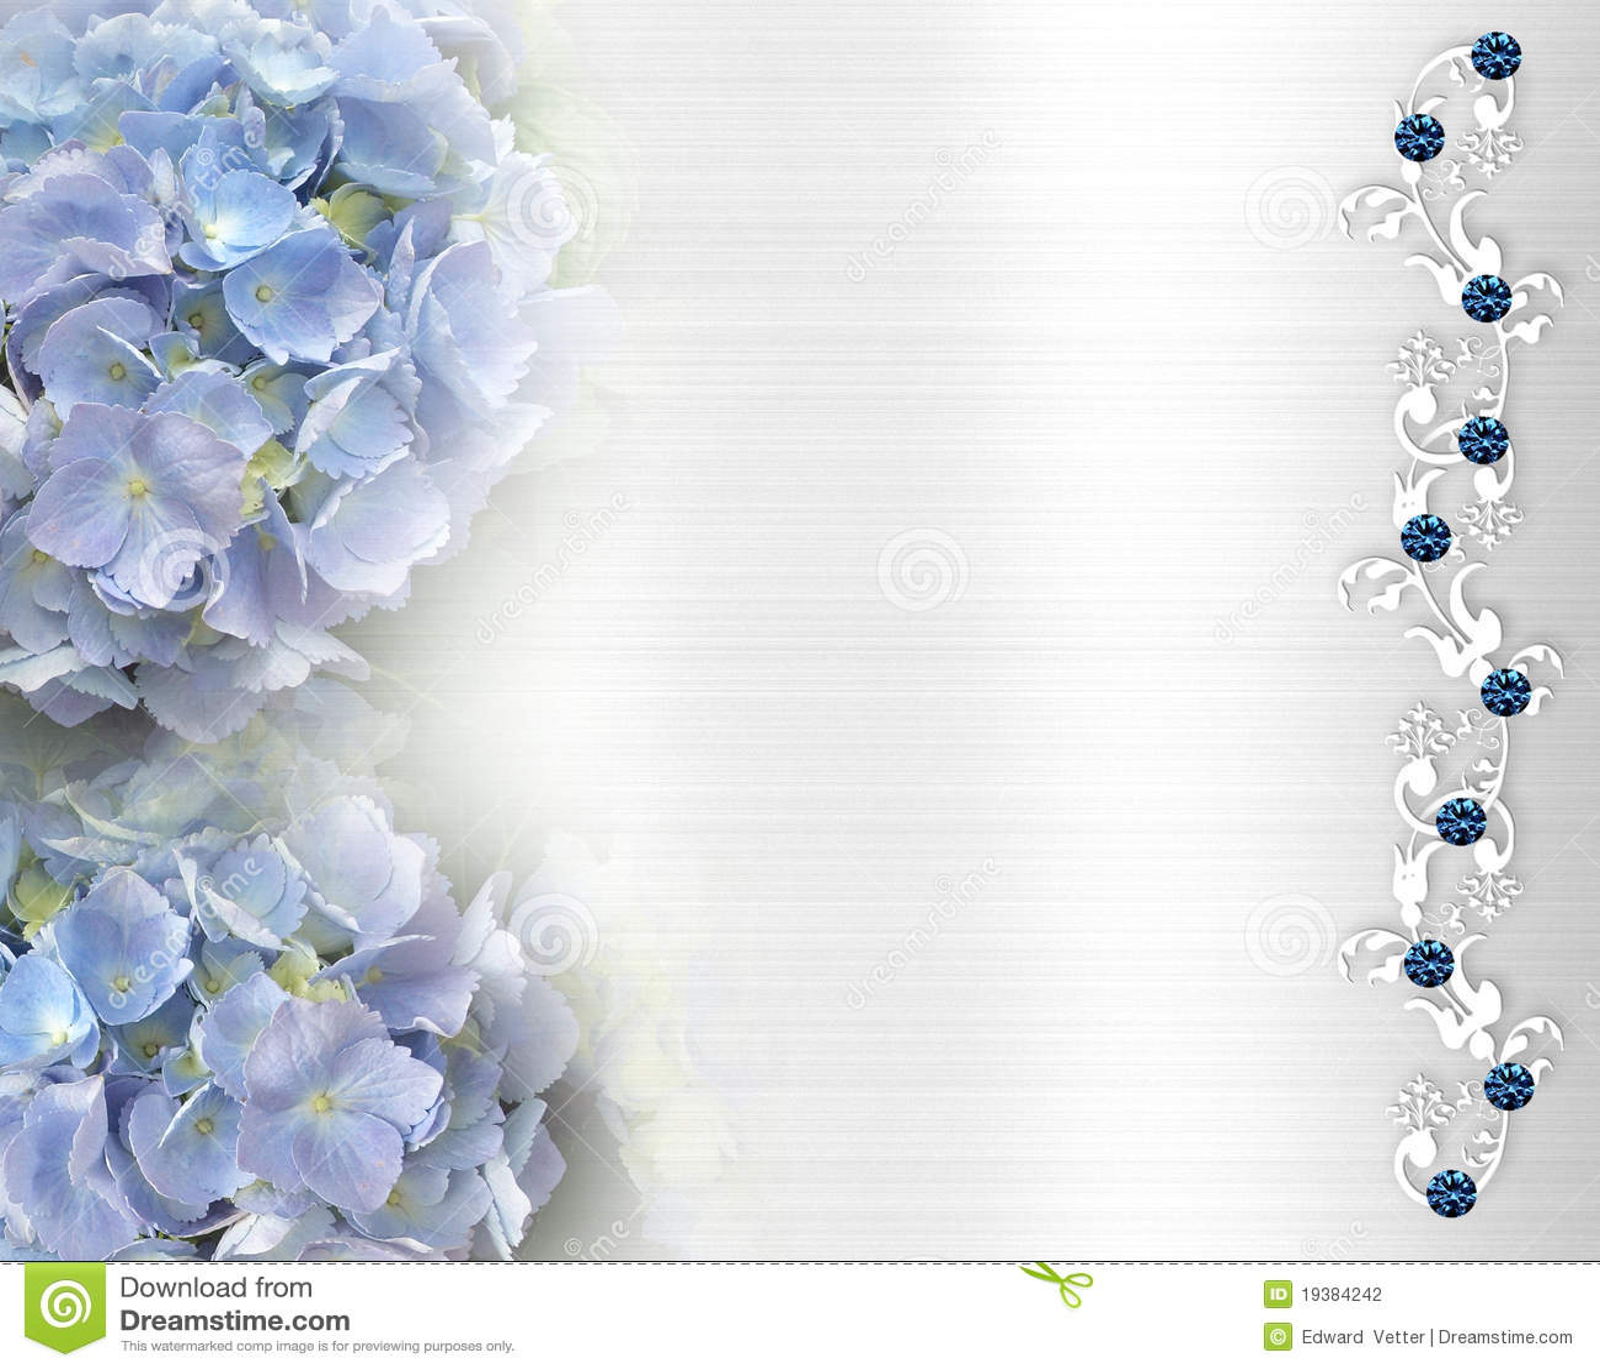 Paper Lace Wedding Invitations as great invitation ideas